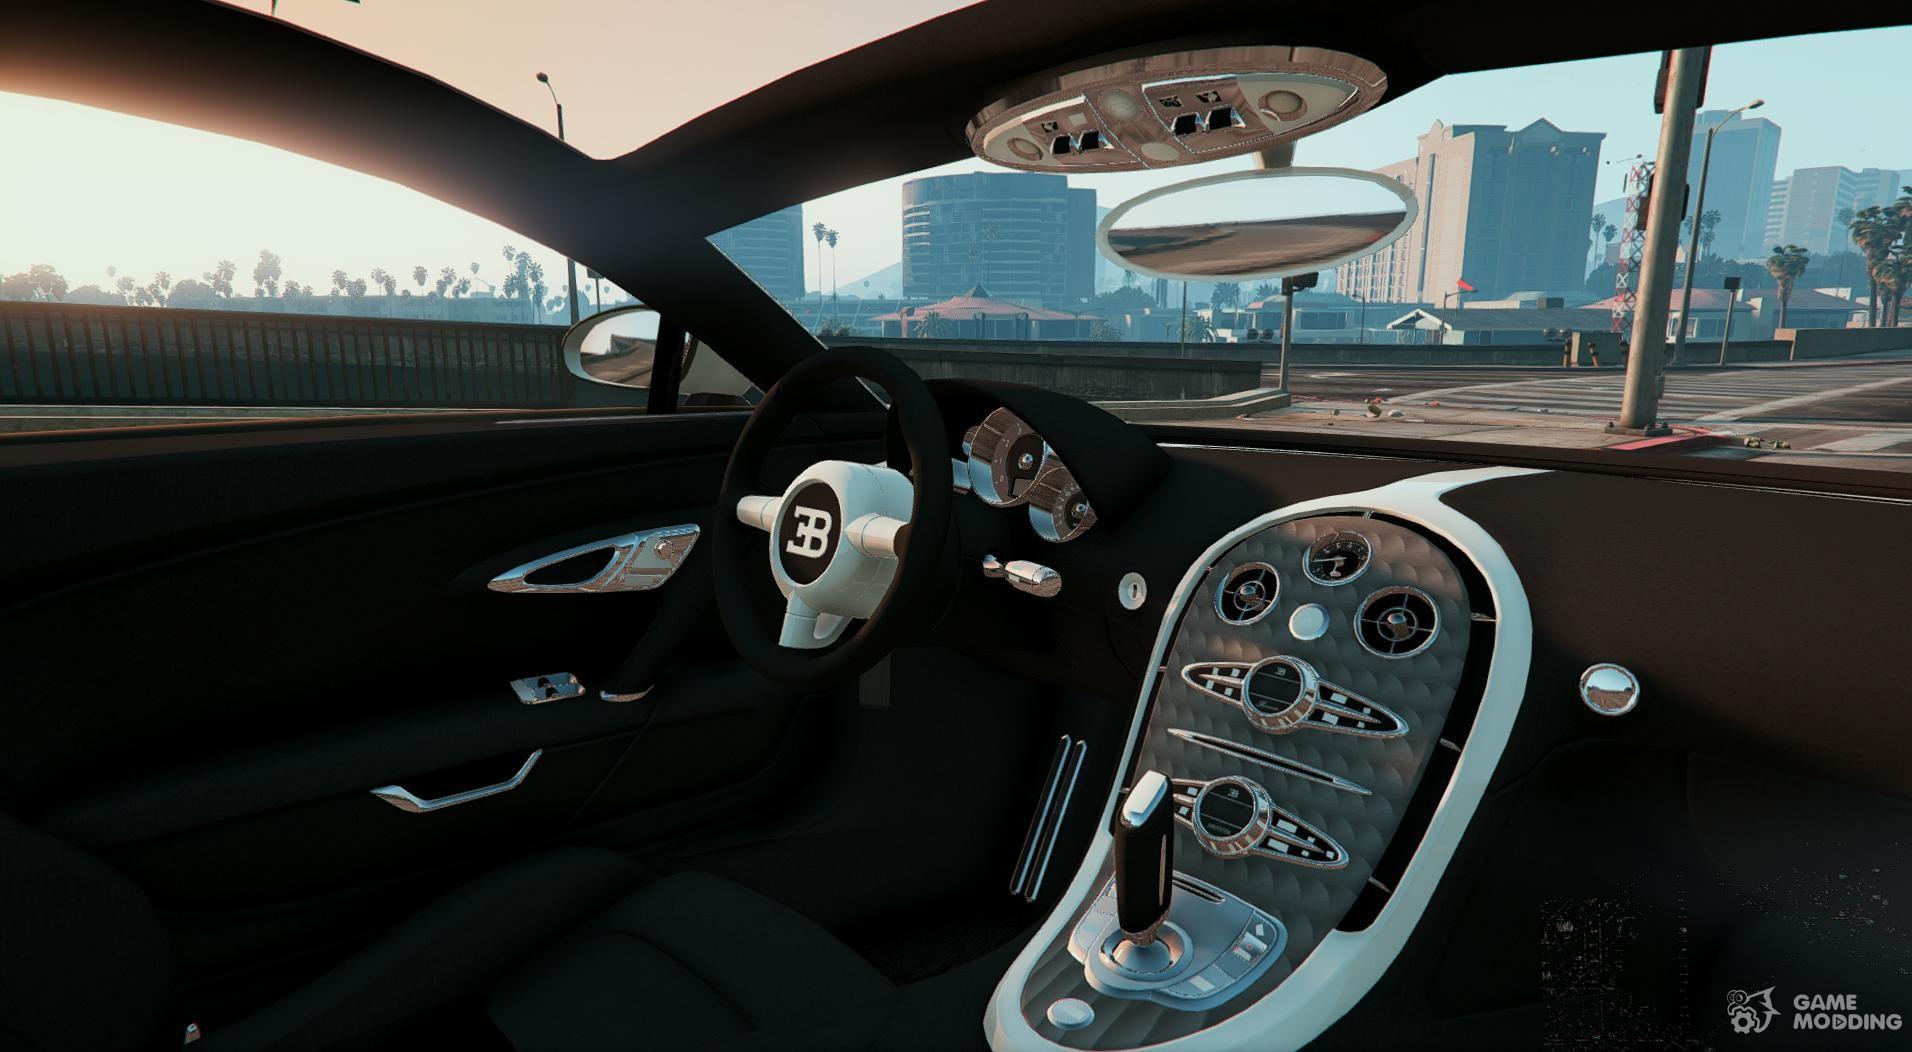 bugatti veyron police for gta 5. Black Bedroom Furniture Sets. Home Design Ideas